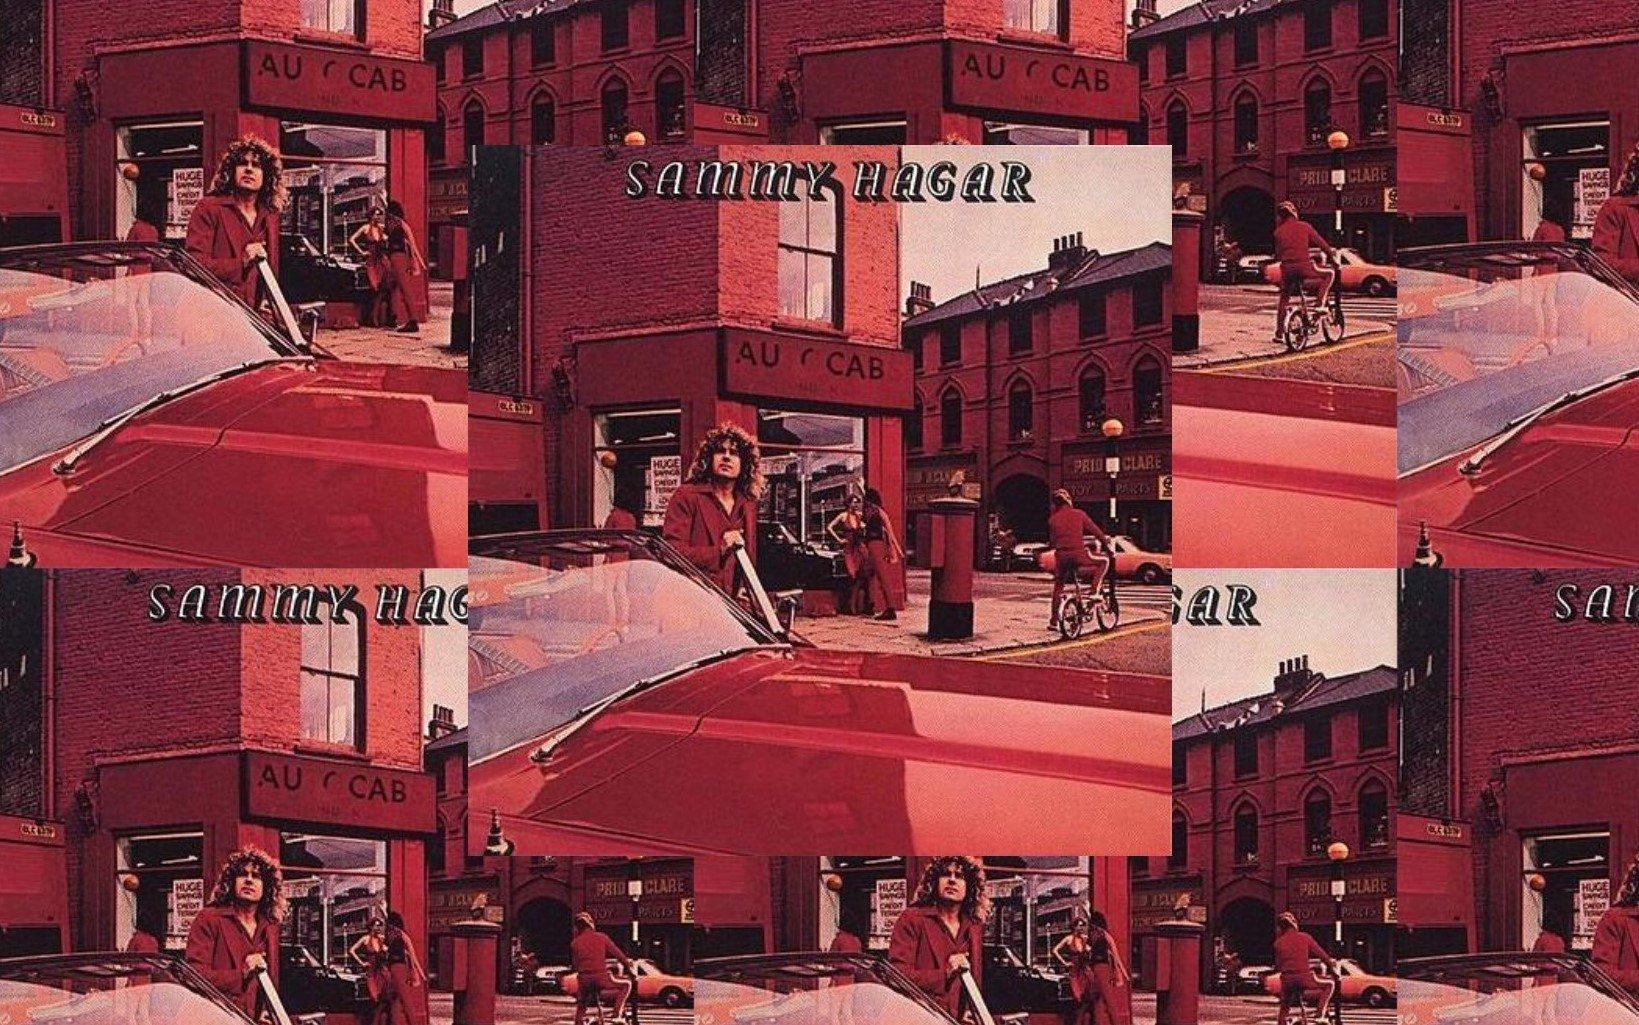 Top 10 Sammy Hagar Album Covers